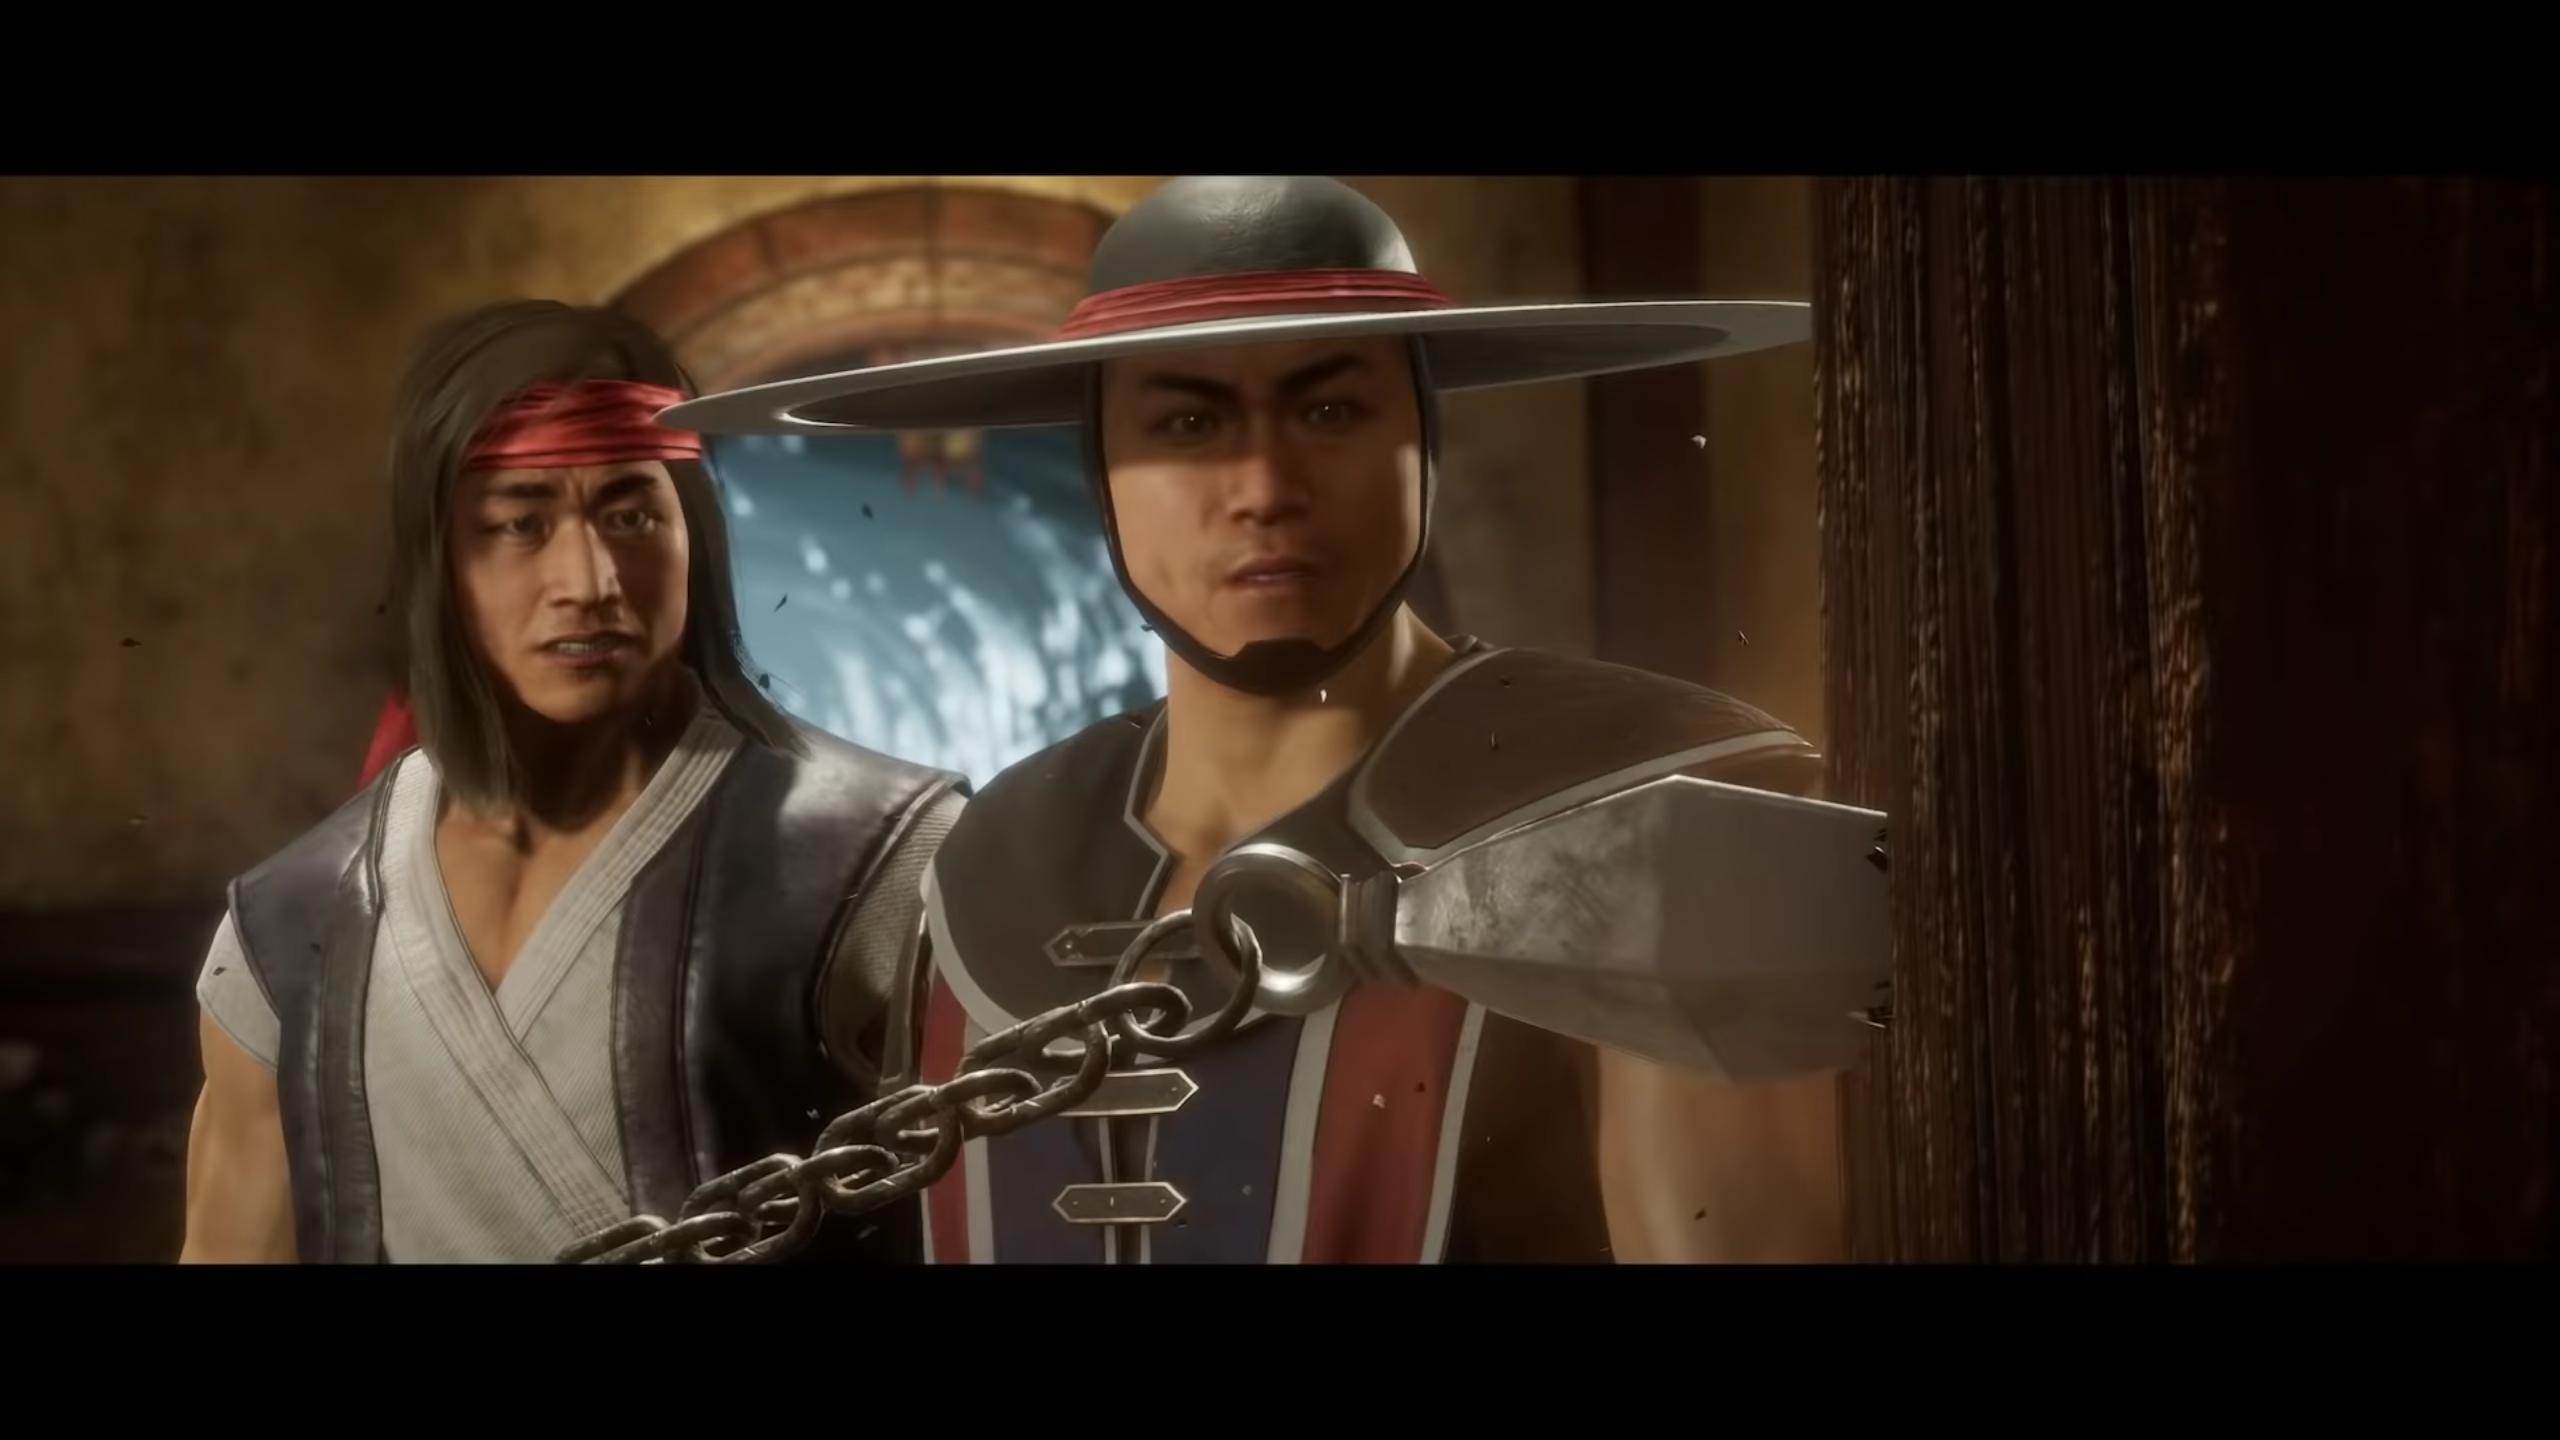 Https Vignette Wikia Nocookie Net Mkwikia Images Liu Kang Mortal Kombat 11 2165113 Hd Wallpaper Backgrounds Download